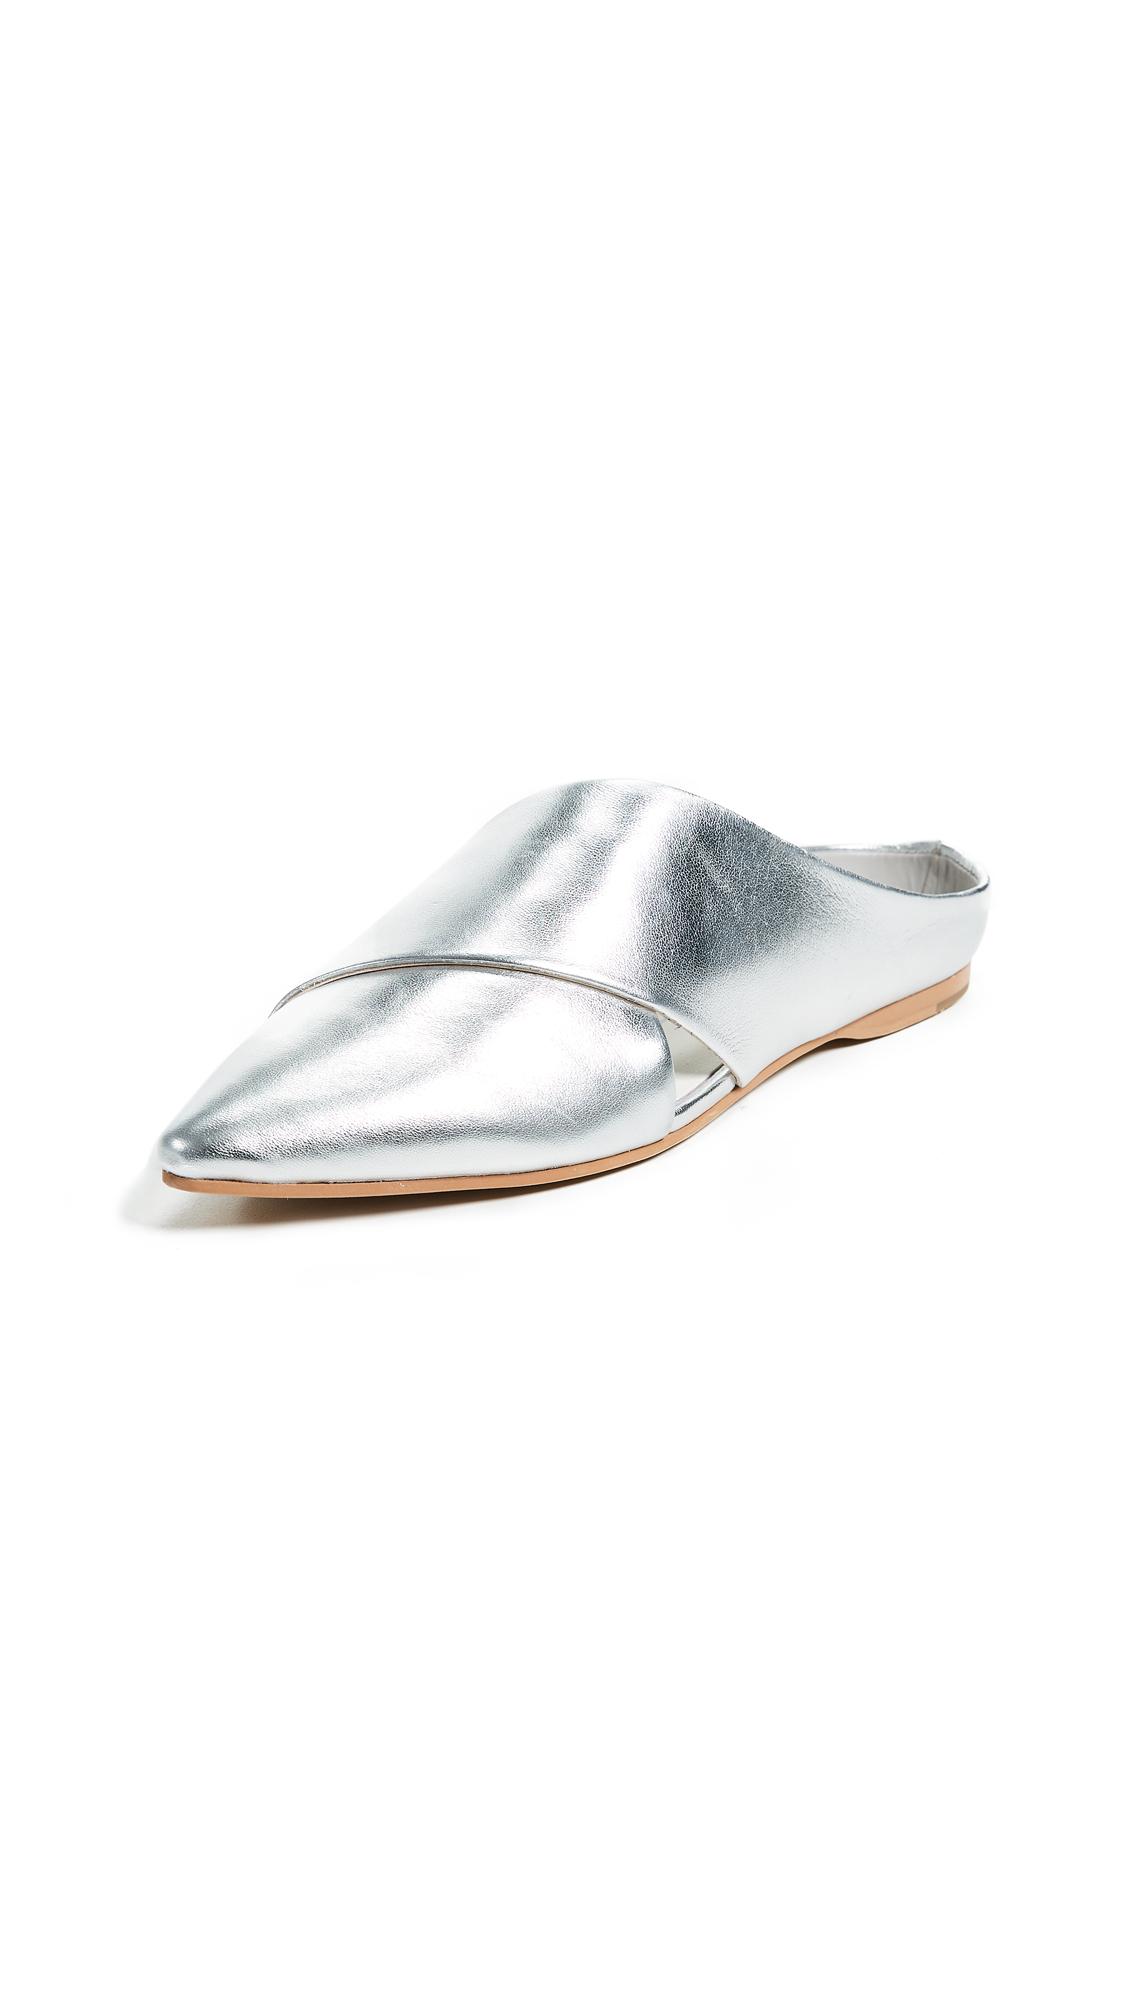 Dolce Vita Camia Point Toe Mules - Silver